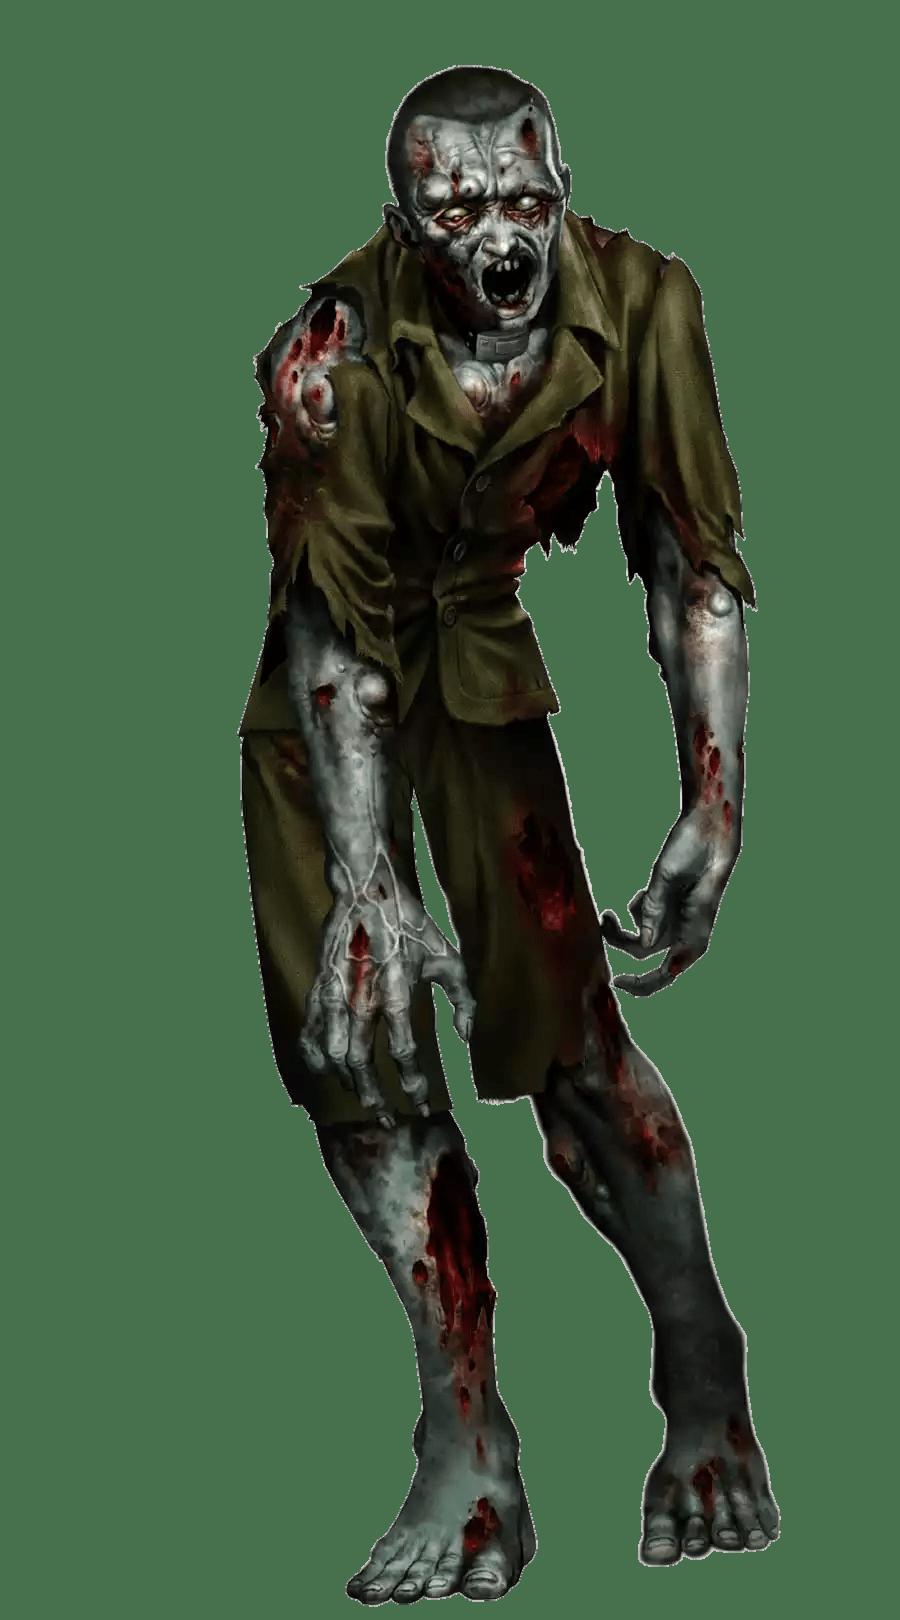 Zombie clipart werewolf. Creepy png photos